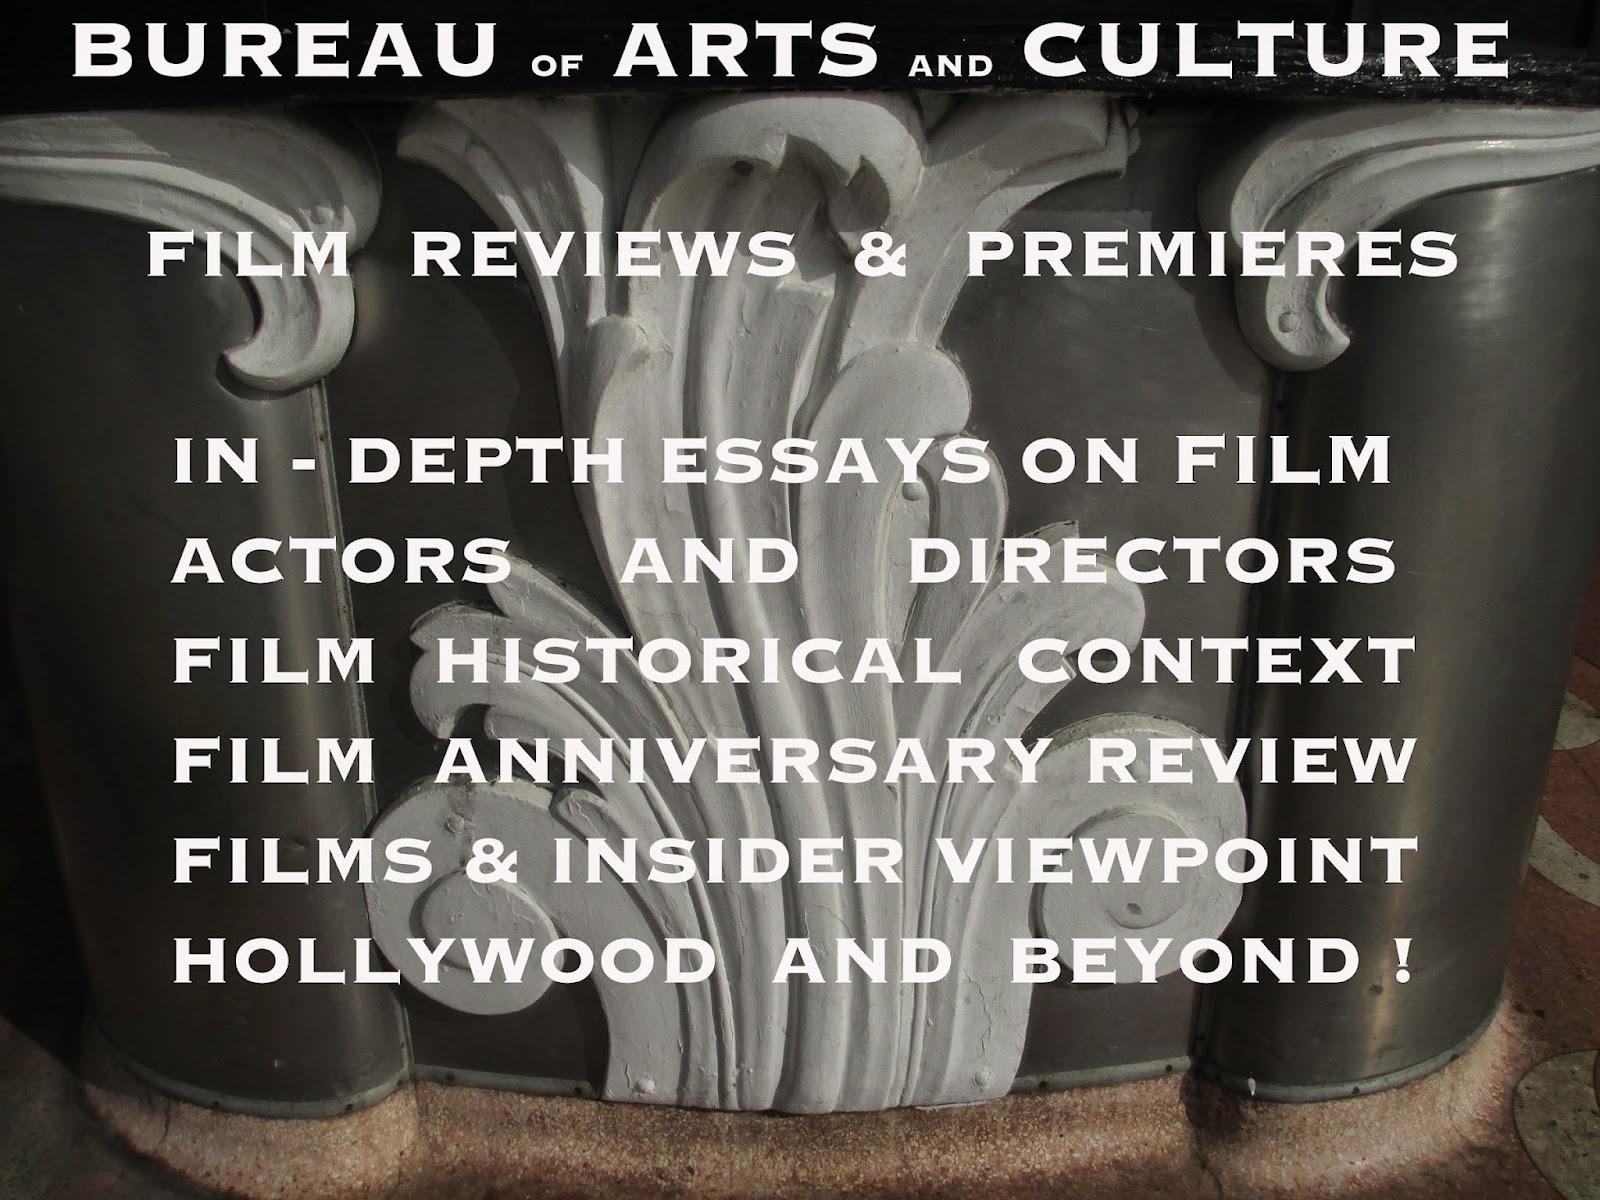 essays on films online diversity in disney films critical essays  bureau magazine literature project bureau literary film bureau literary film